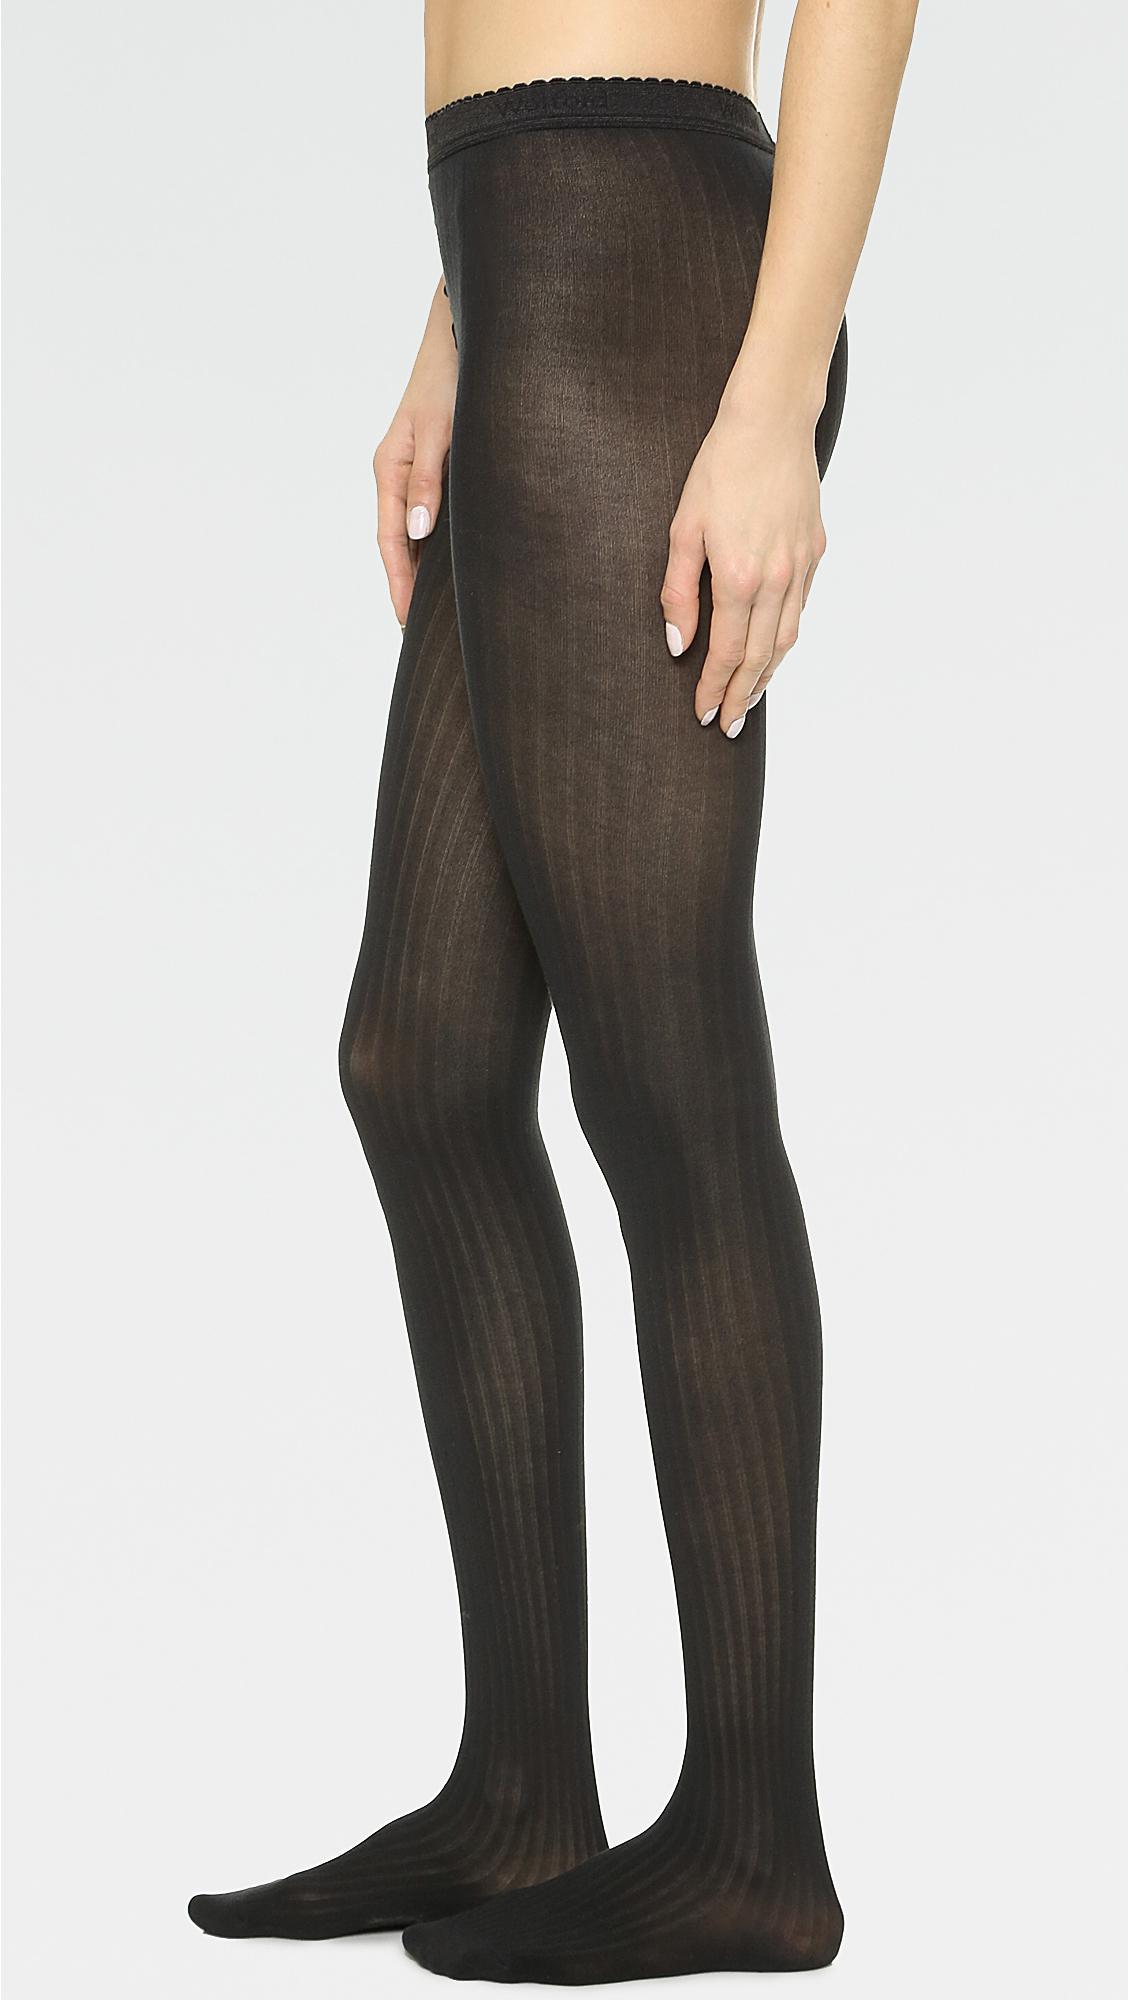 b6cf4076e58 Wolford Fine Cotton Rib Tights in Black - Lyst